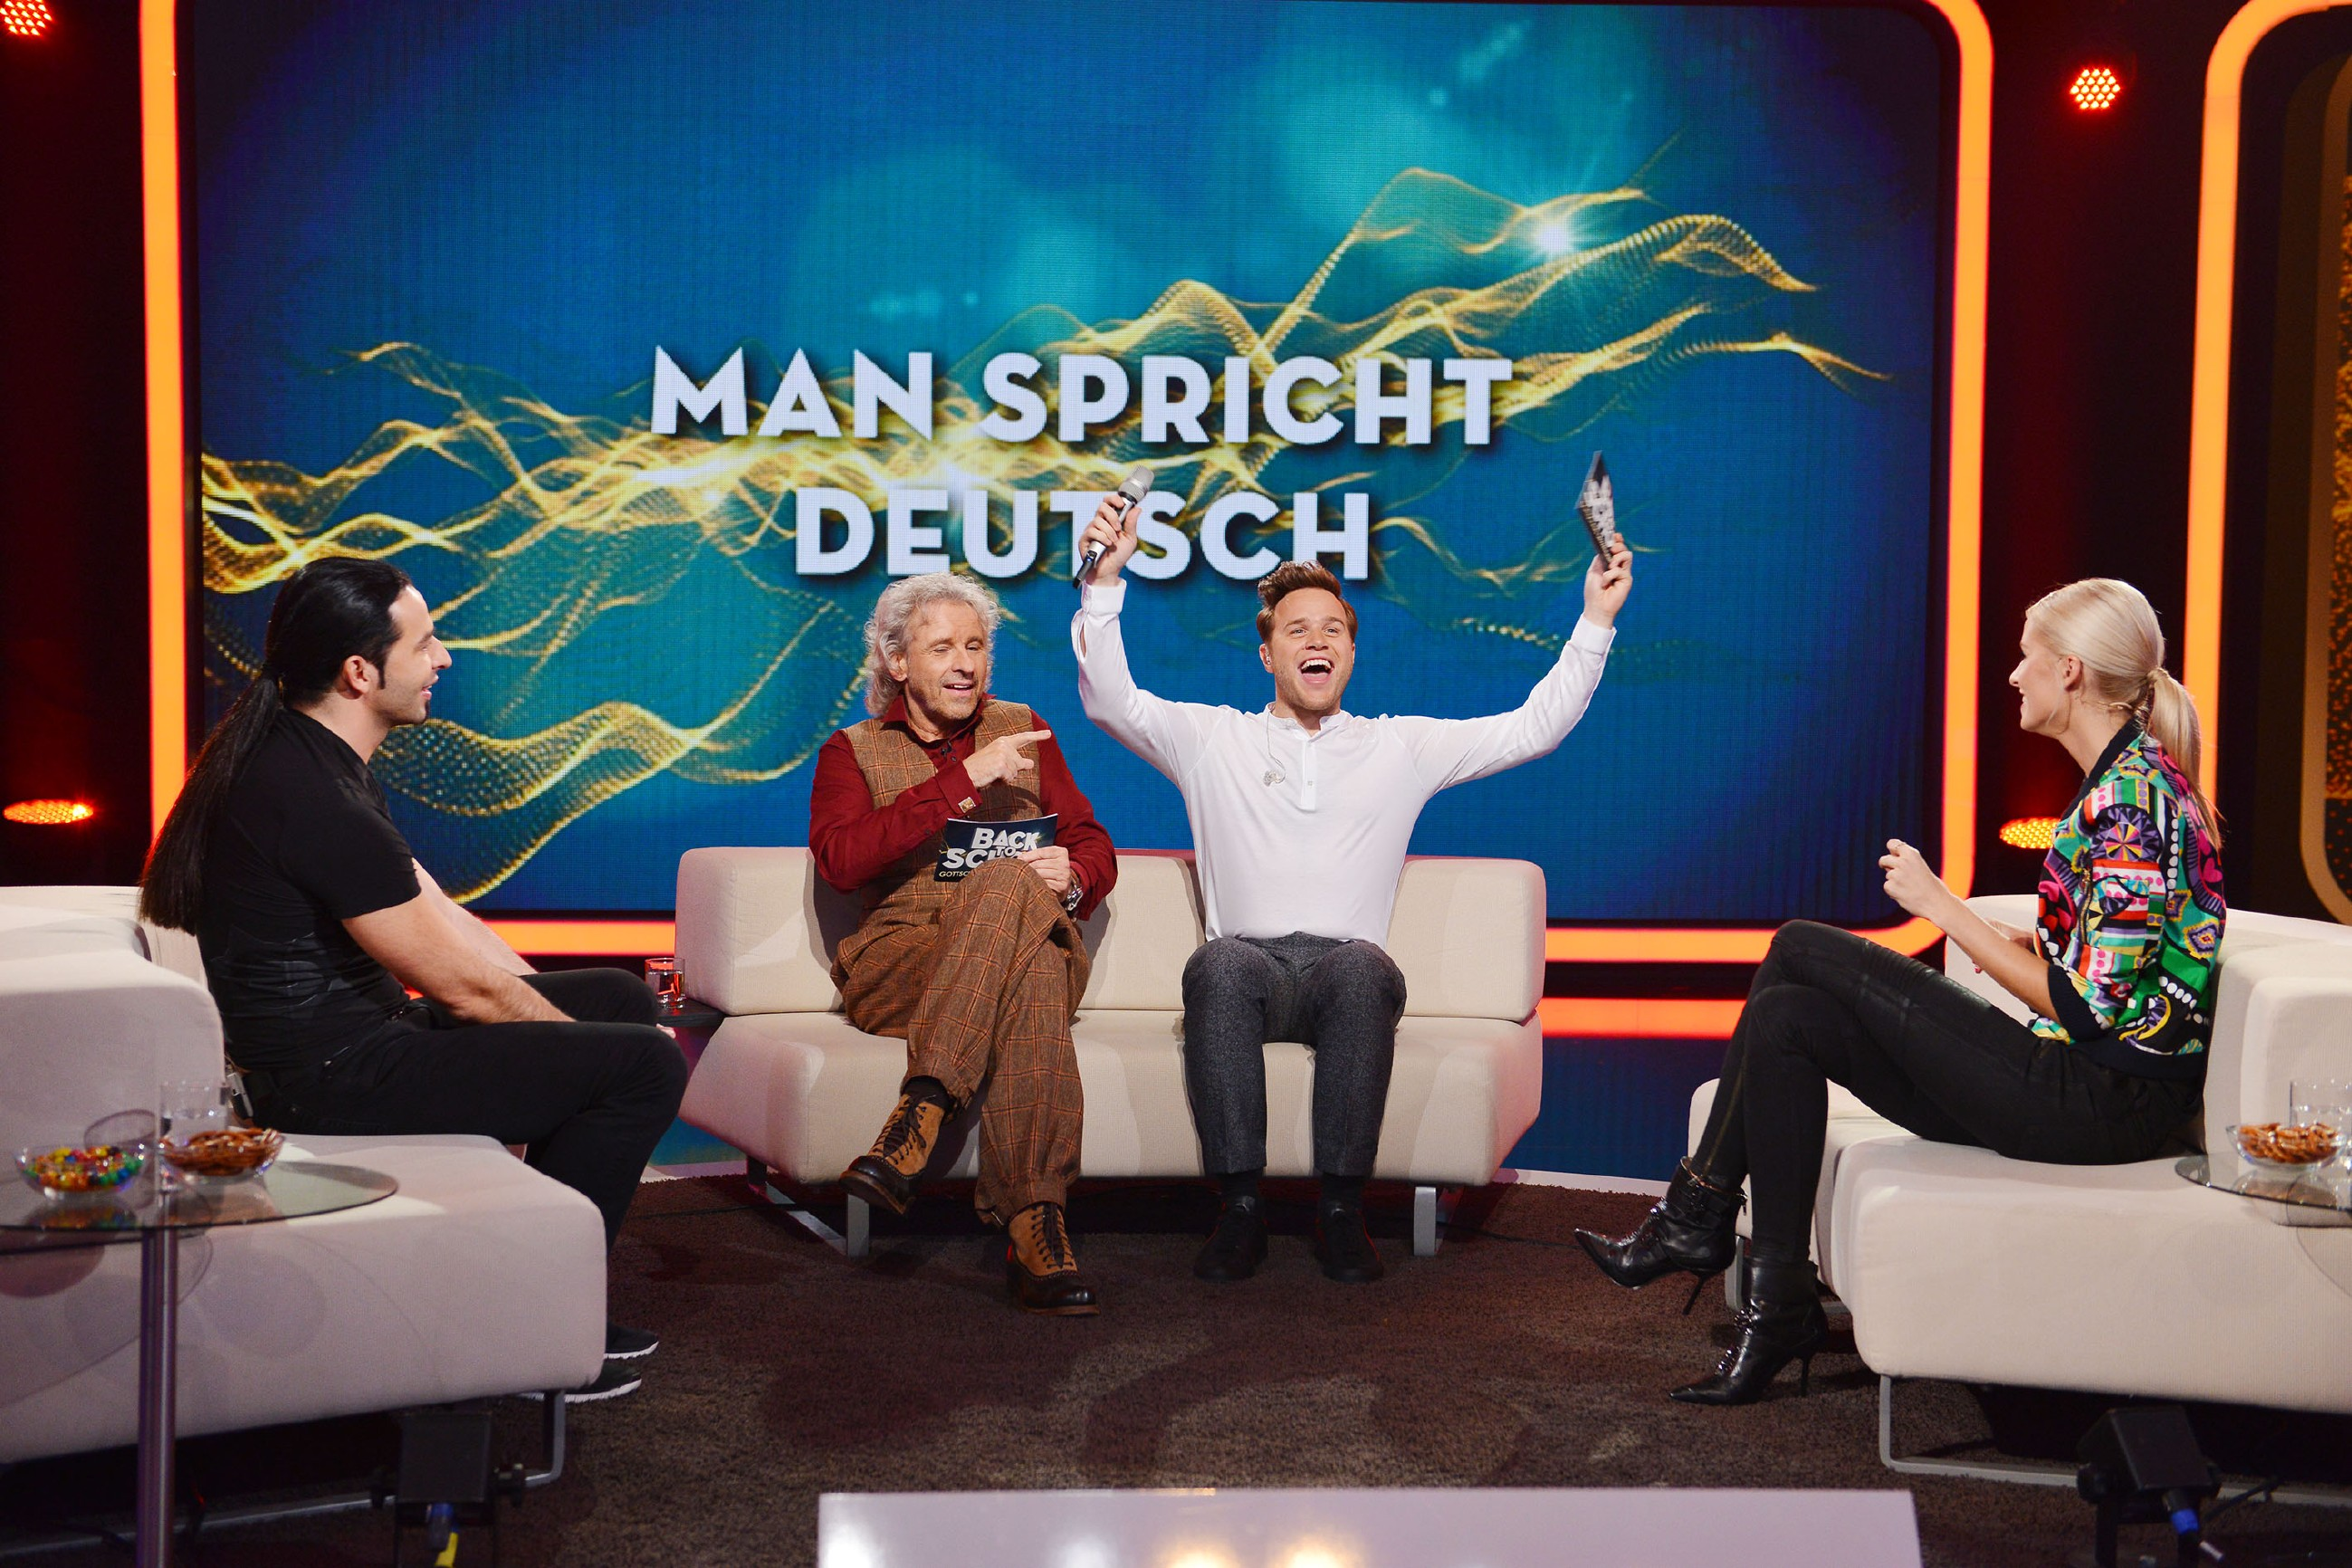 Back To School Olly Murs Bülent Ceylan Lena Gercke Und Thomas